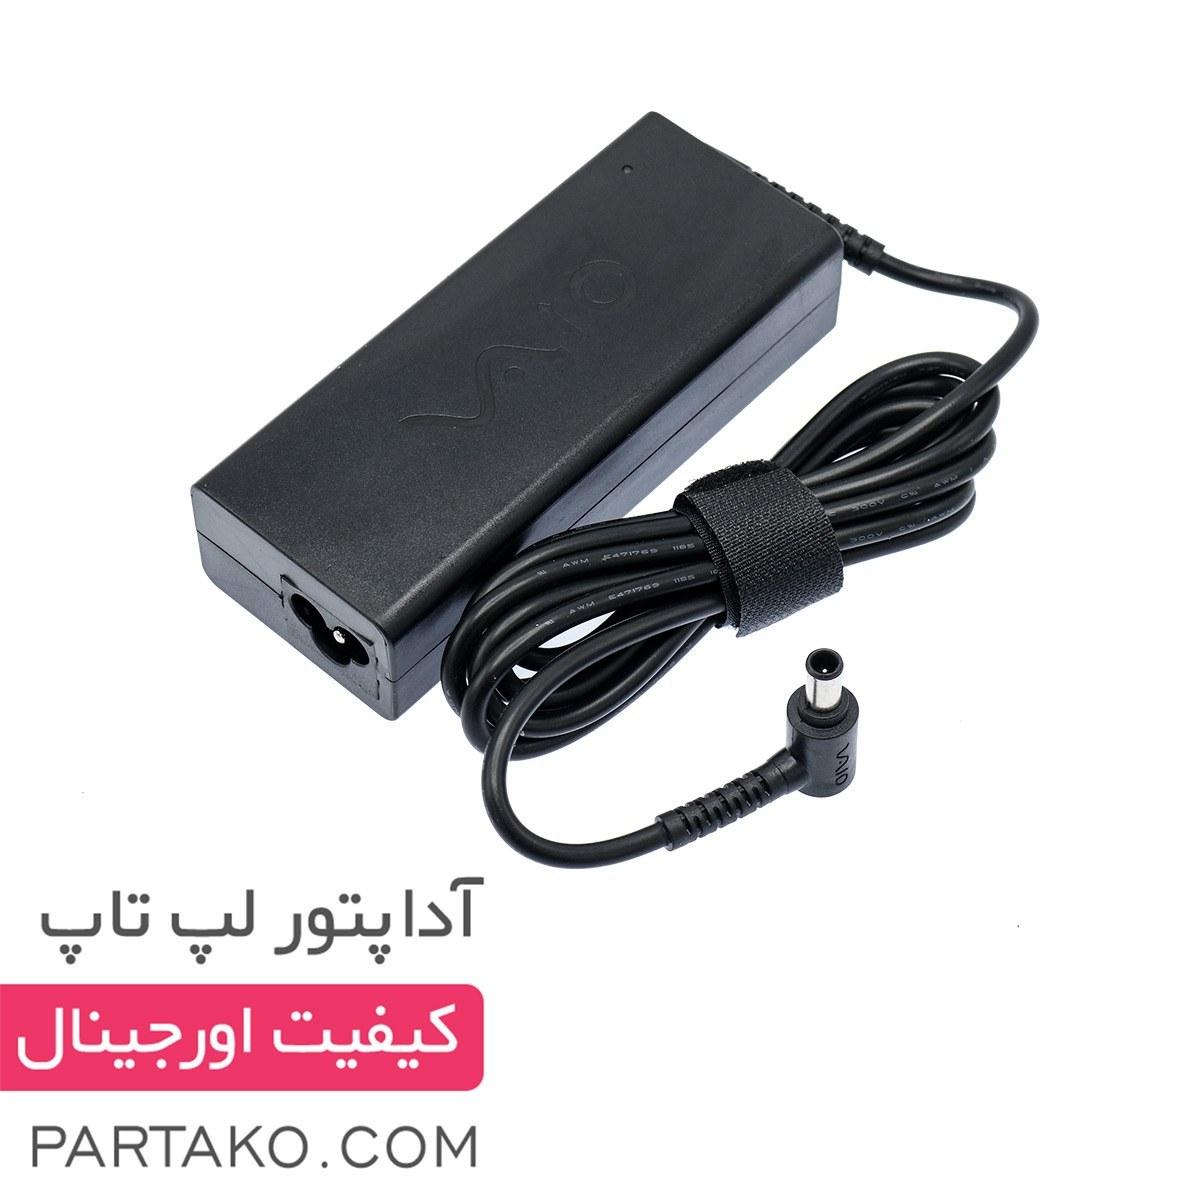 تصویر شارژر لپ تاپ سونی 19.5 ولت 4.74 آمپر VGA-AC19V42 SONY ADAPTER 19.5V 4.74A